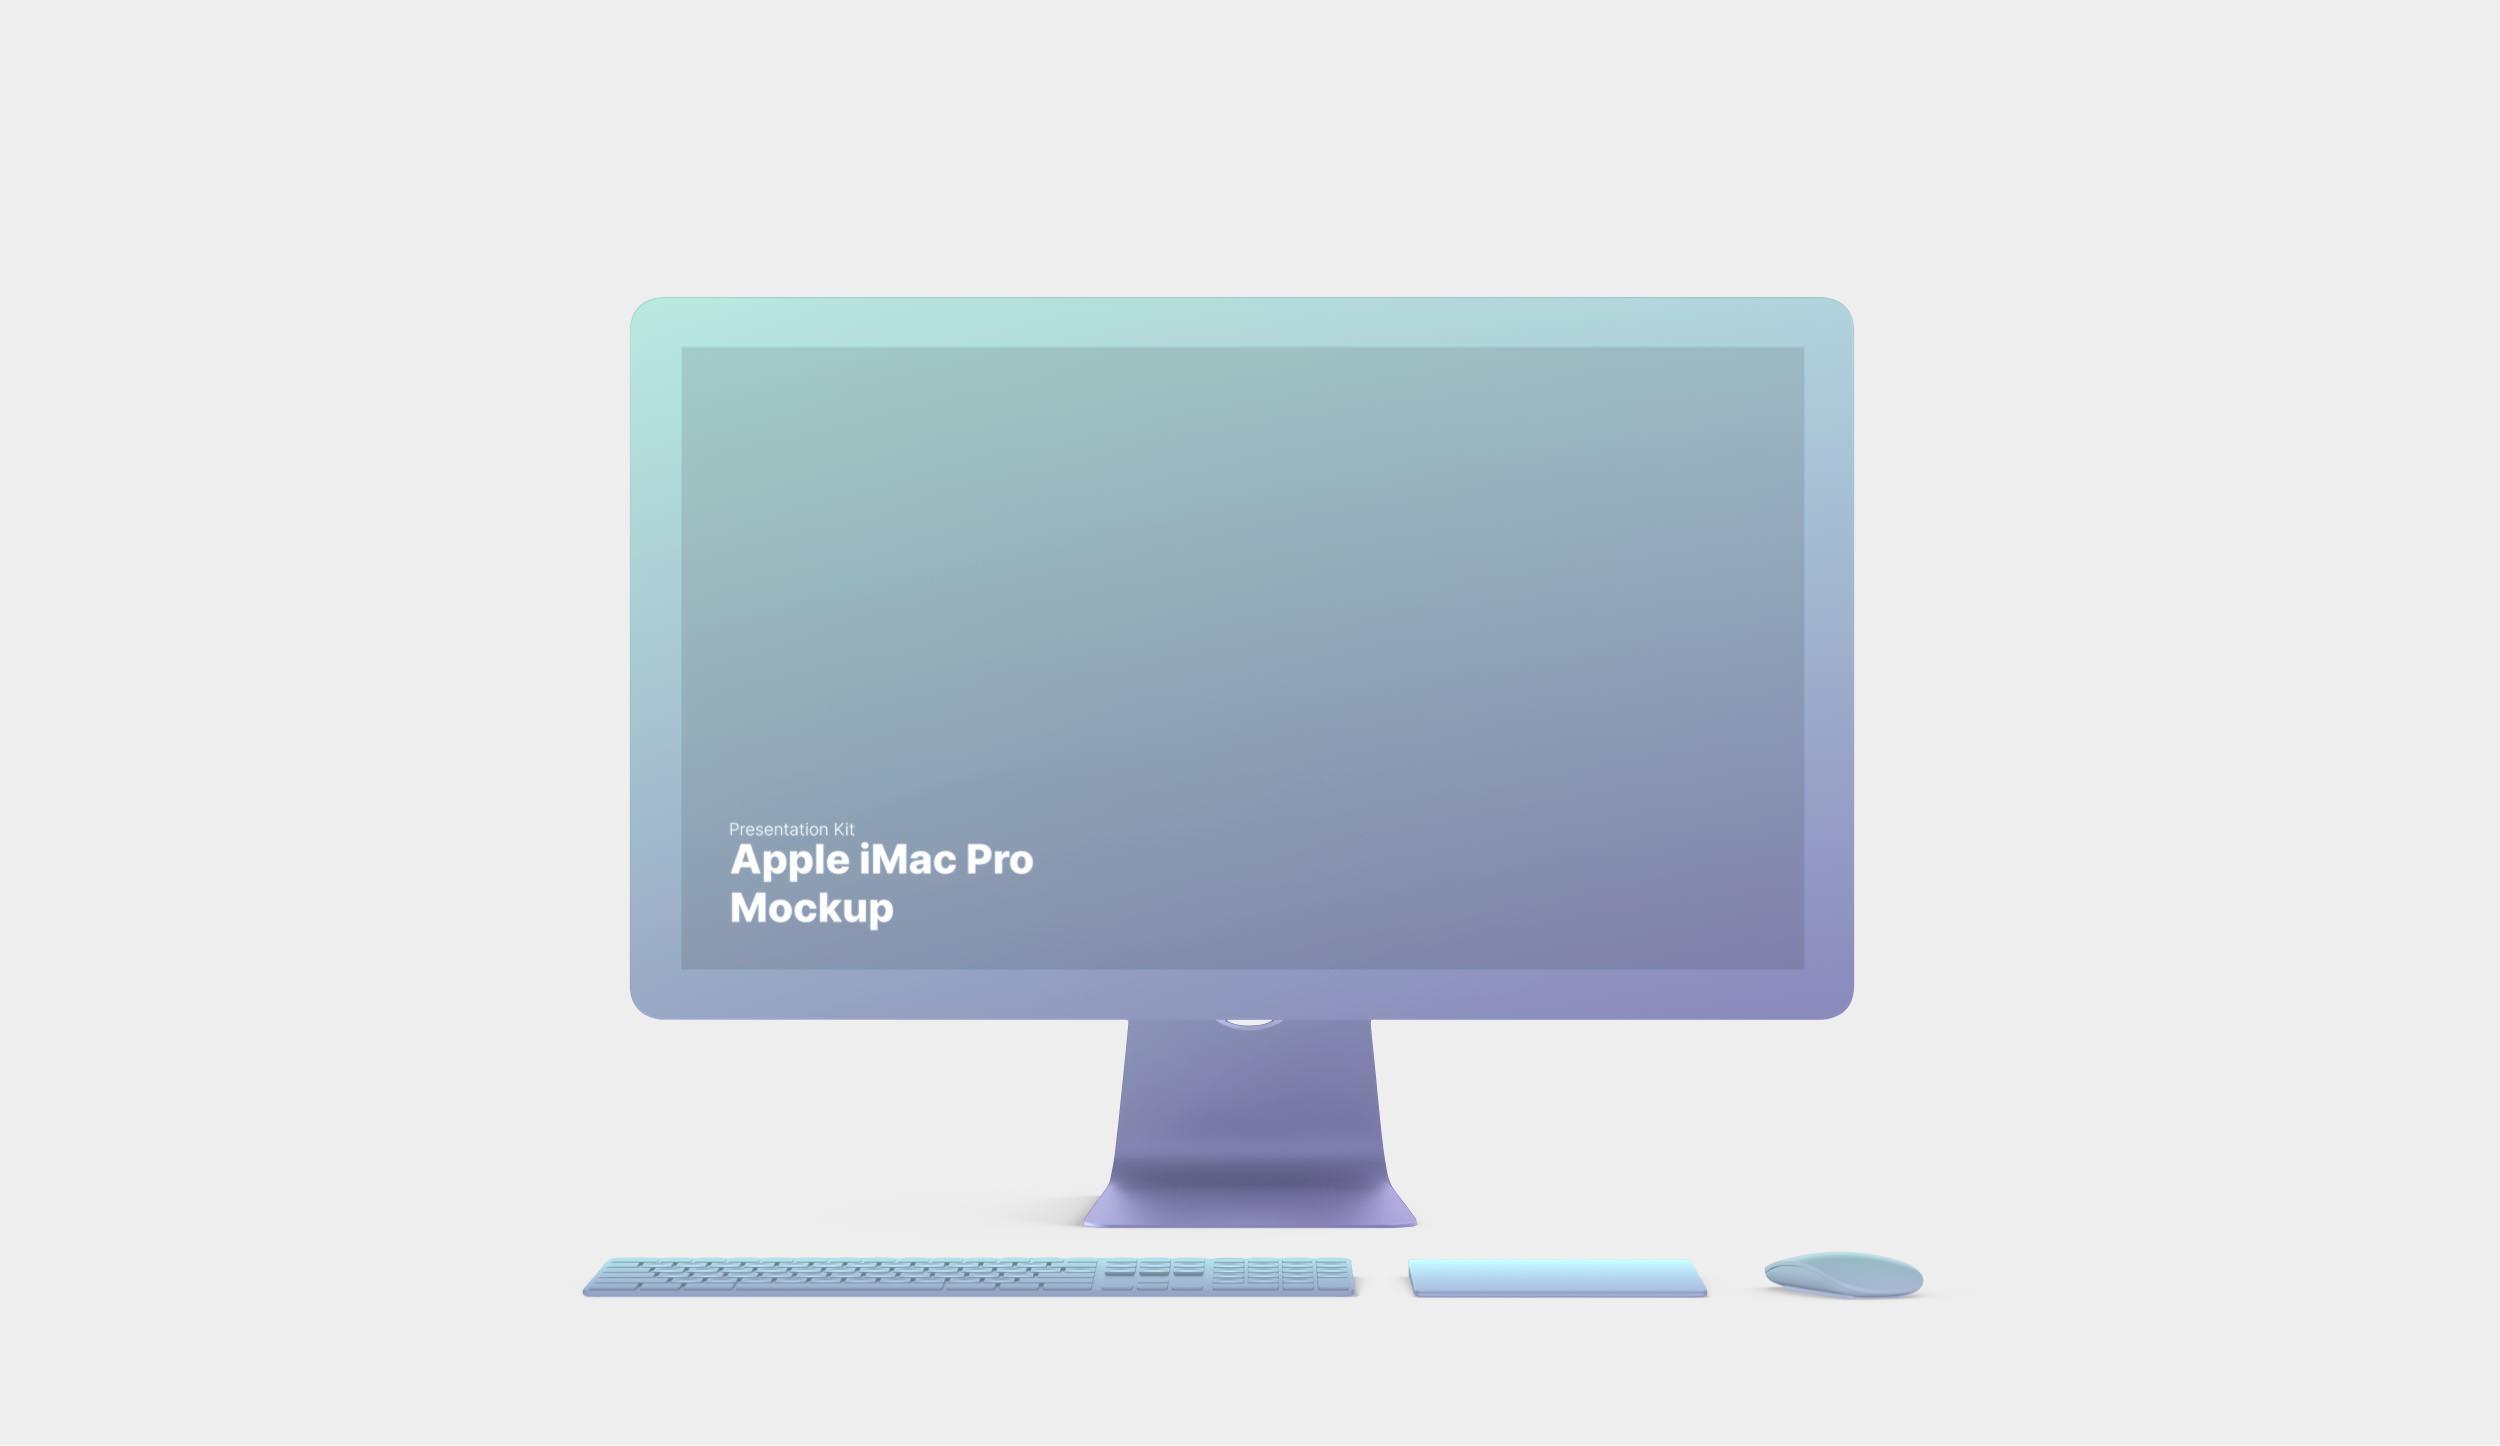 iMac Pro Mockup for Sketch, Photoshop, Figma